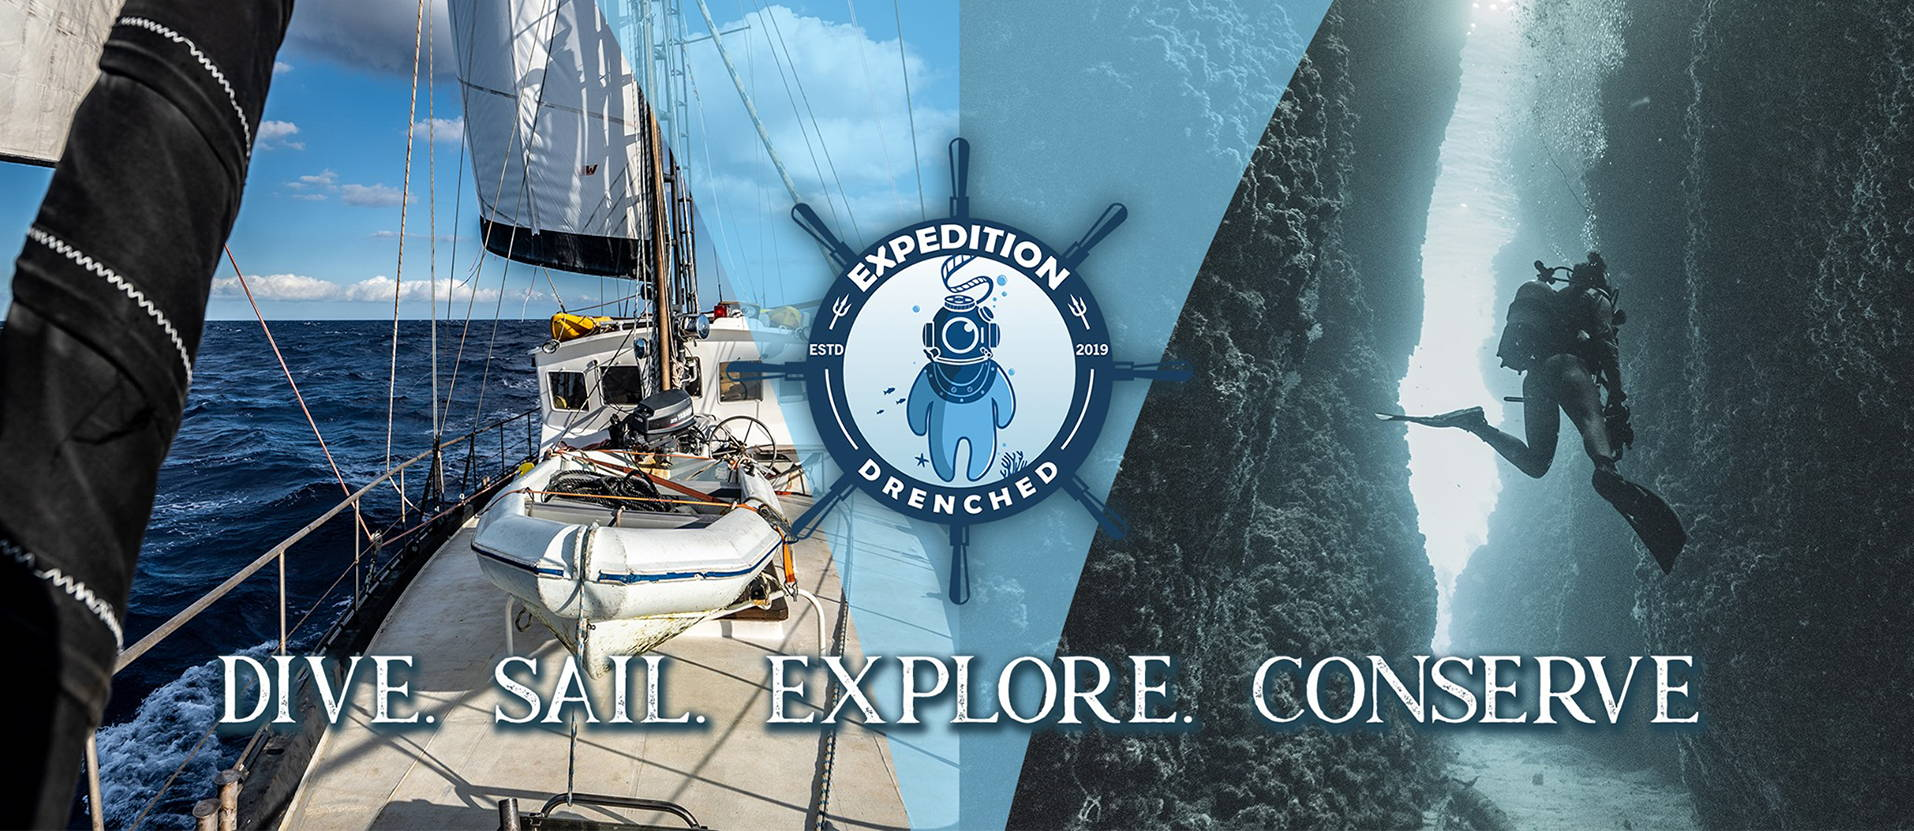 Dive. Sail. Explore. Conserve | Expedition Drenched